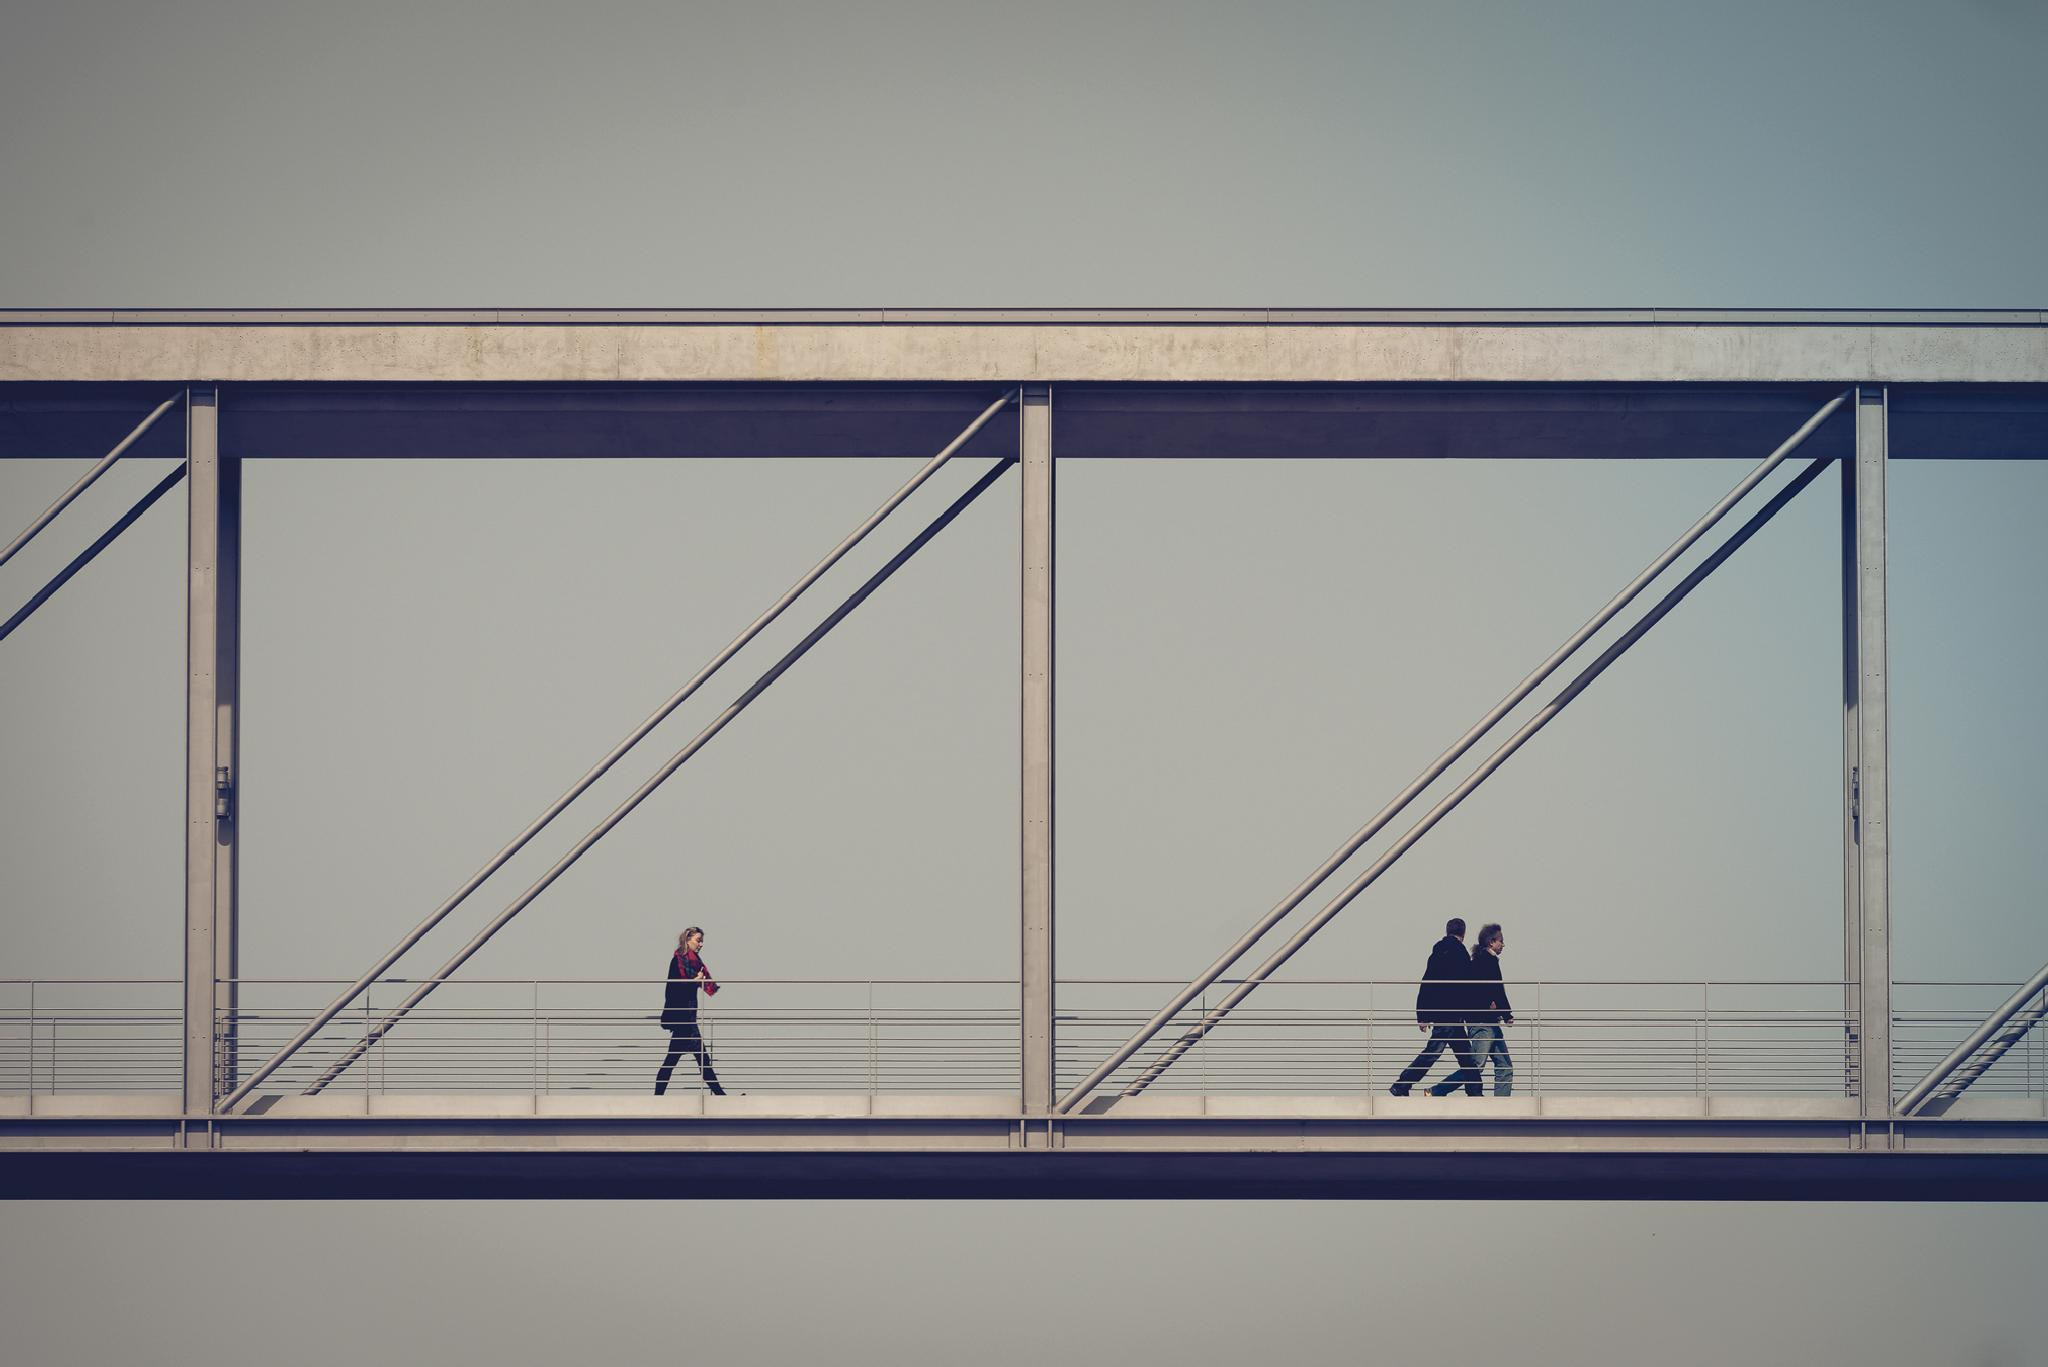 Catwalk by ThomasBechtleFotografie